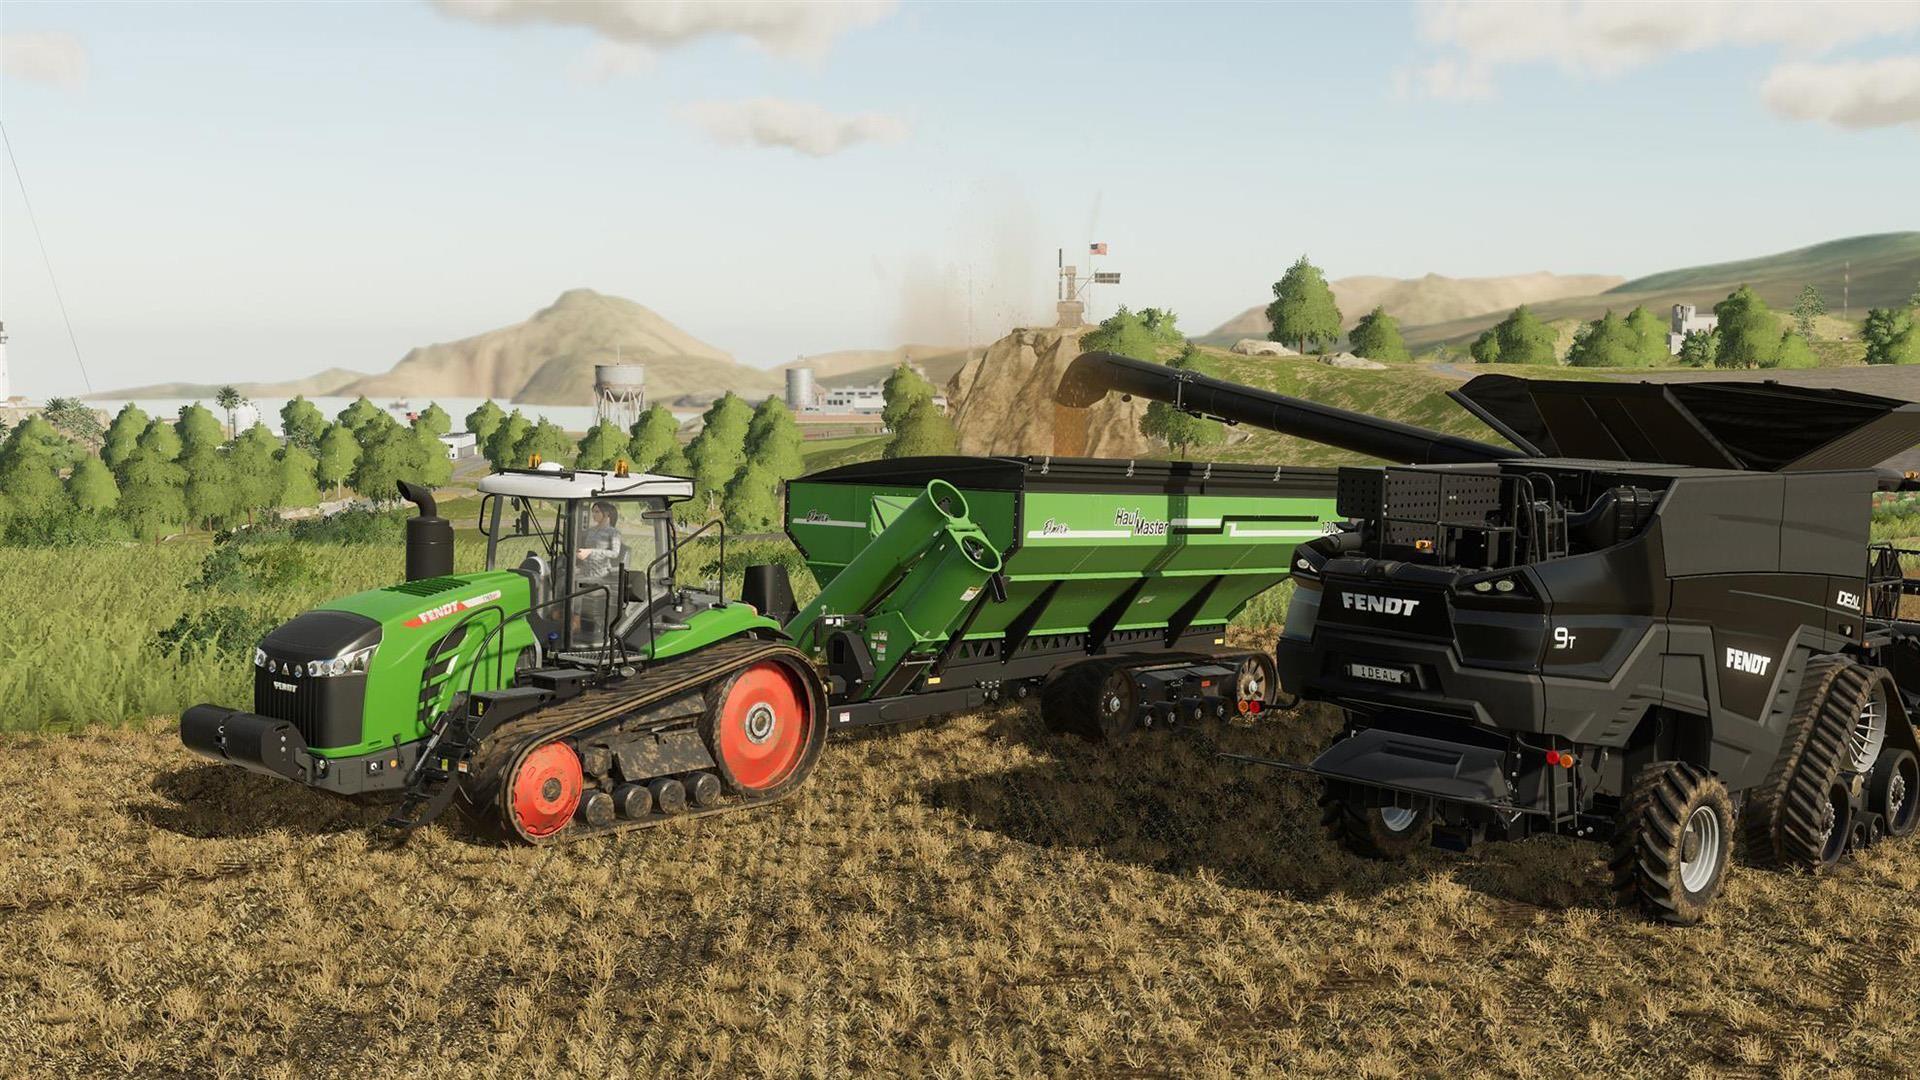 Gra PS4 Farming Simulator 2019-3512899120211 3512899120211